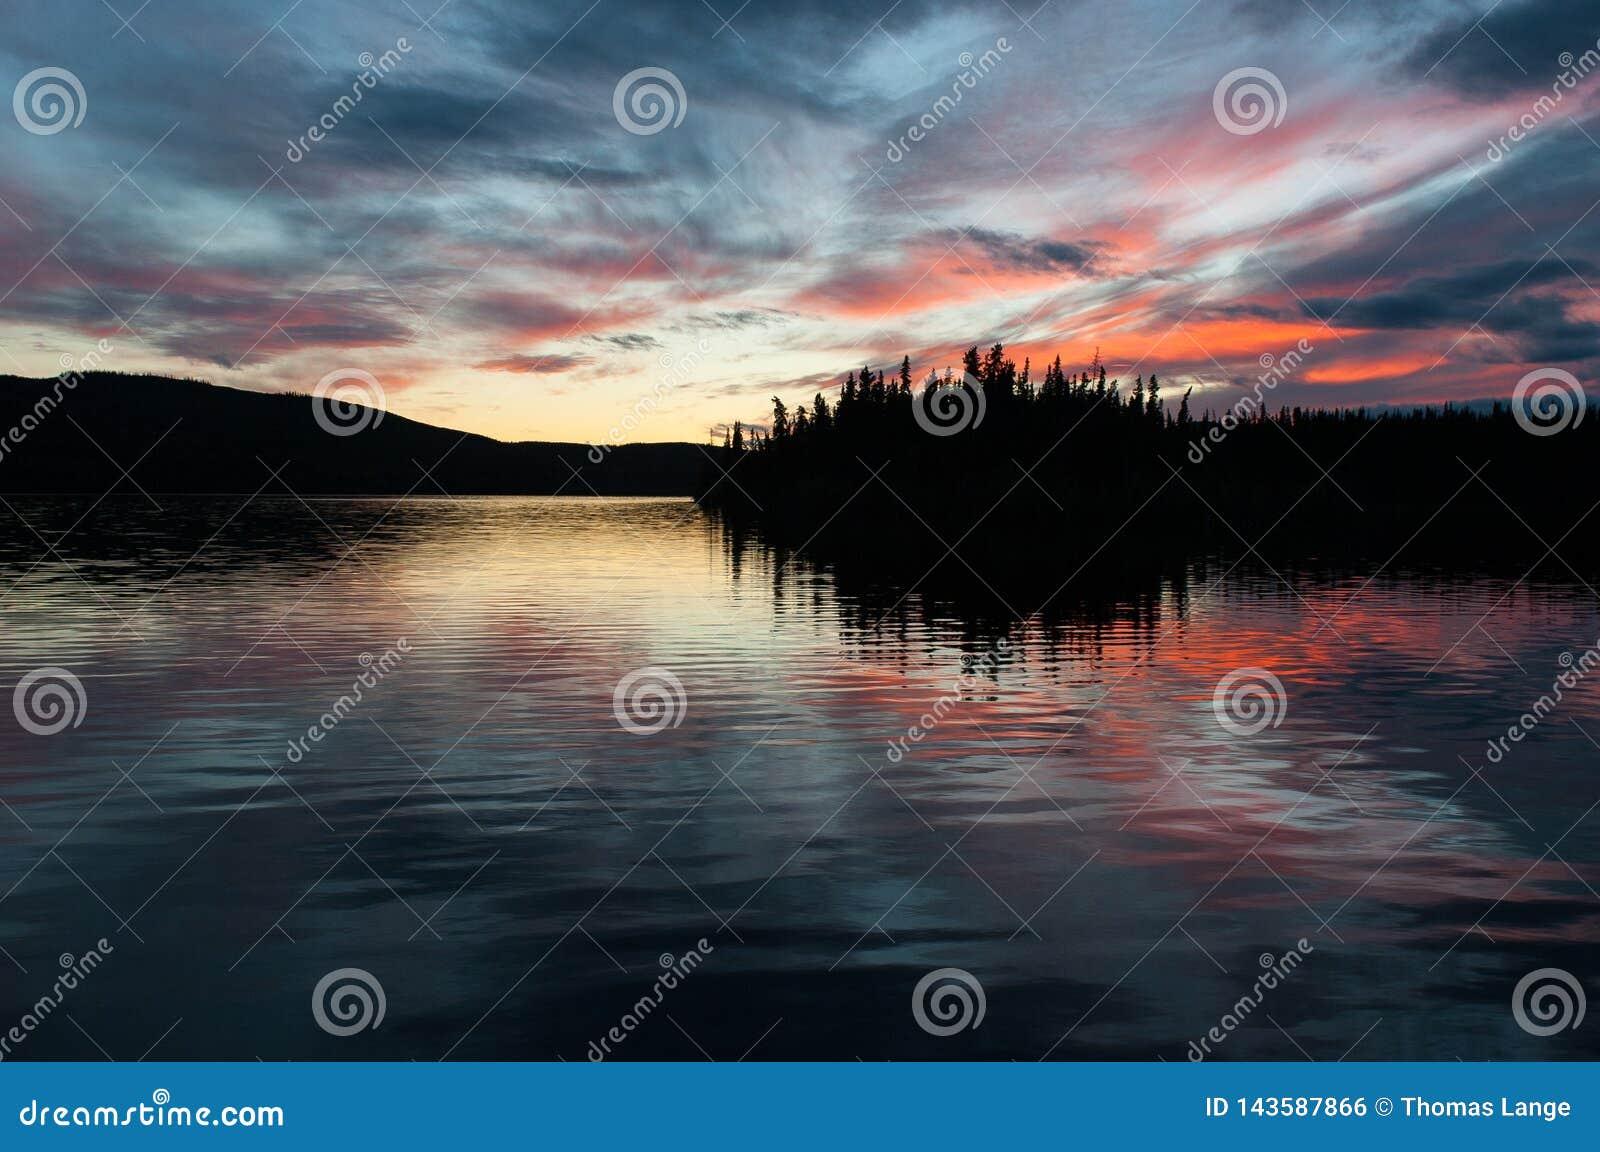 Последний свет дня - исключительная романтичная атмосфера на озере француз, Юконе